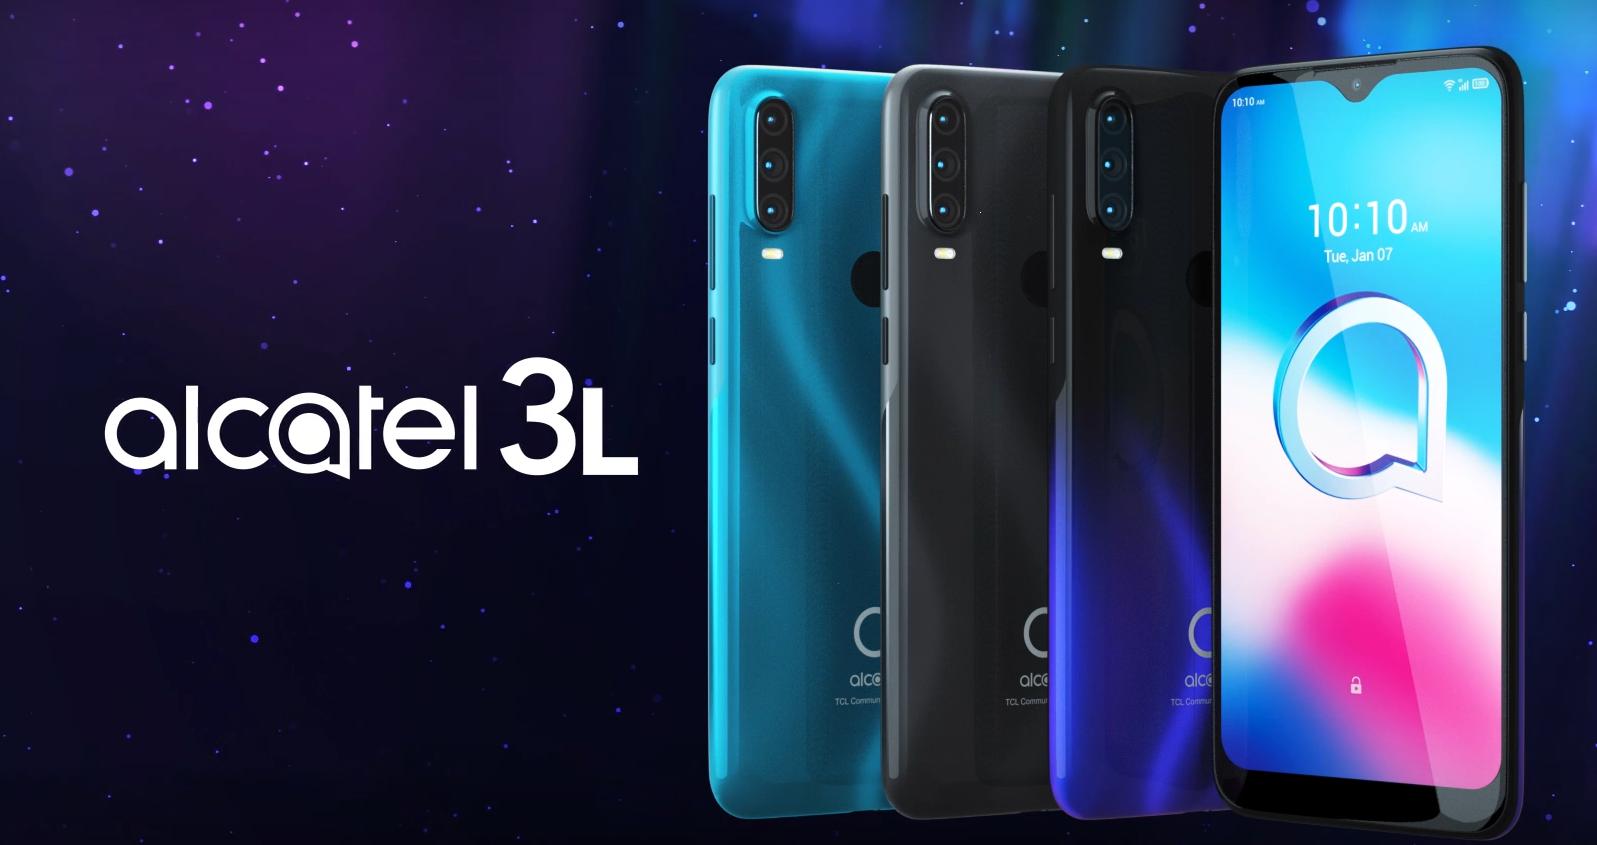 Обзор смартфона Alcatel 3L (2020) с основными характеристиками